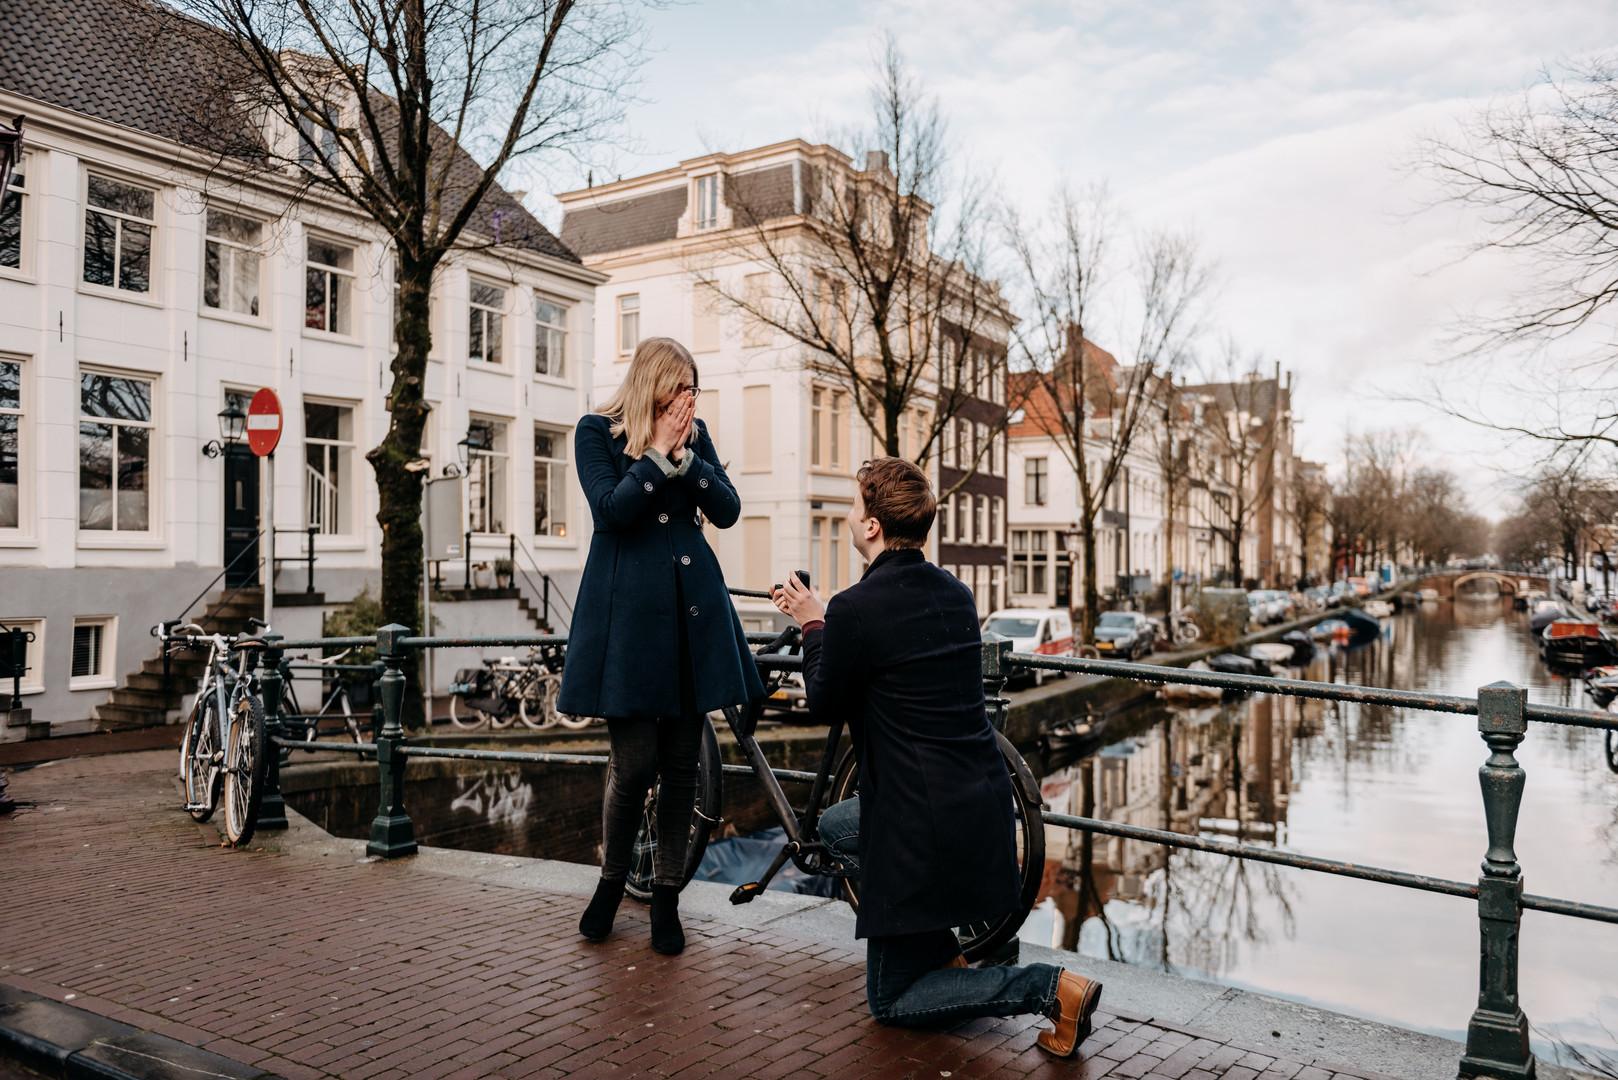 Propoposal photoshoot in Amsterdam   framedbyemily.com